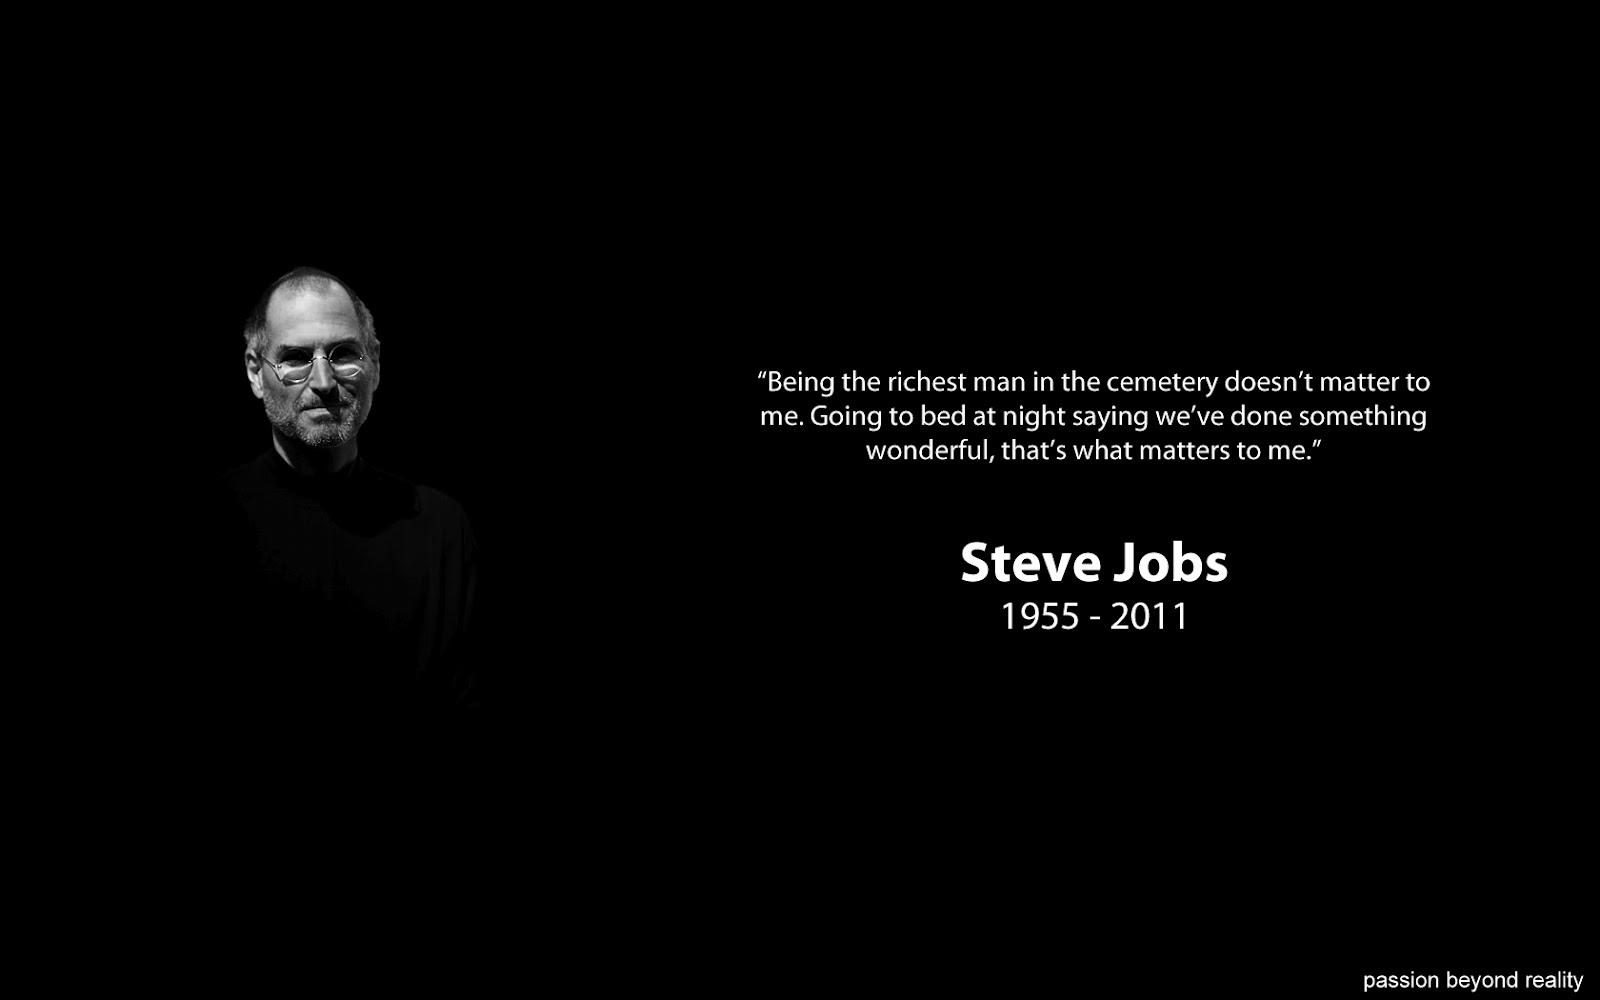 http://1.bp.blogspot.com/-Luqp2PwmunY/UG8BEgO40LI/AAAAAAAAA7Y/bQ_EIgrplzo/s1600/steve-jobs-quote-wallpaper-richest-man-in-brightoak.jpg